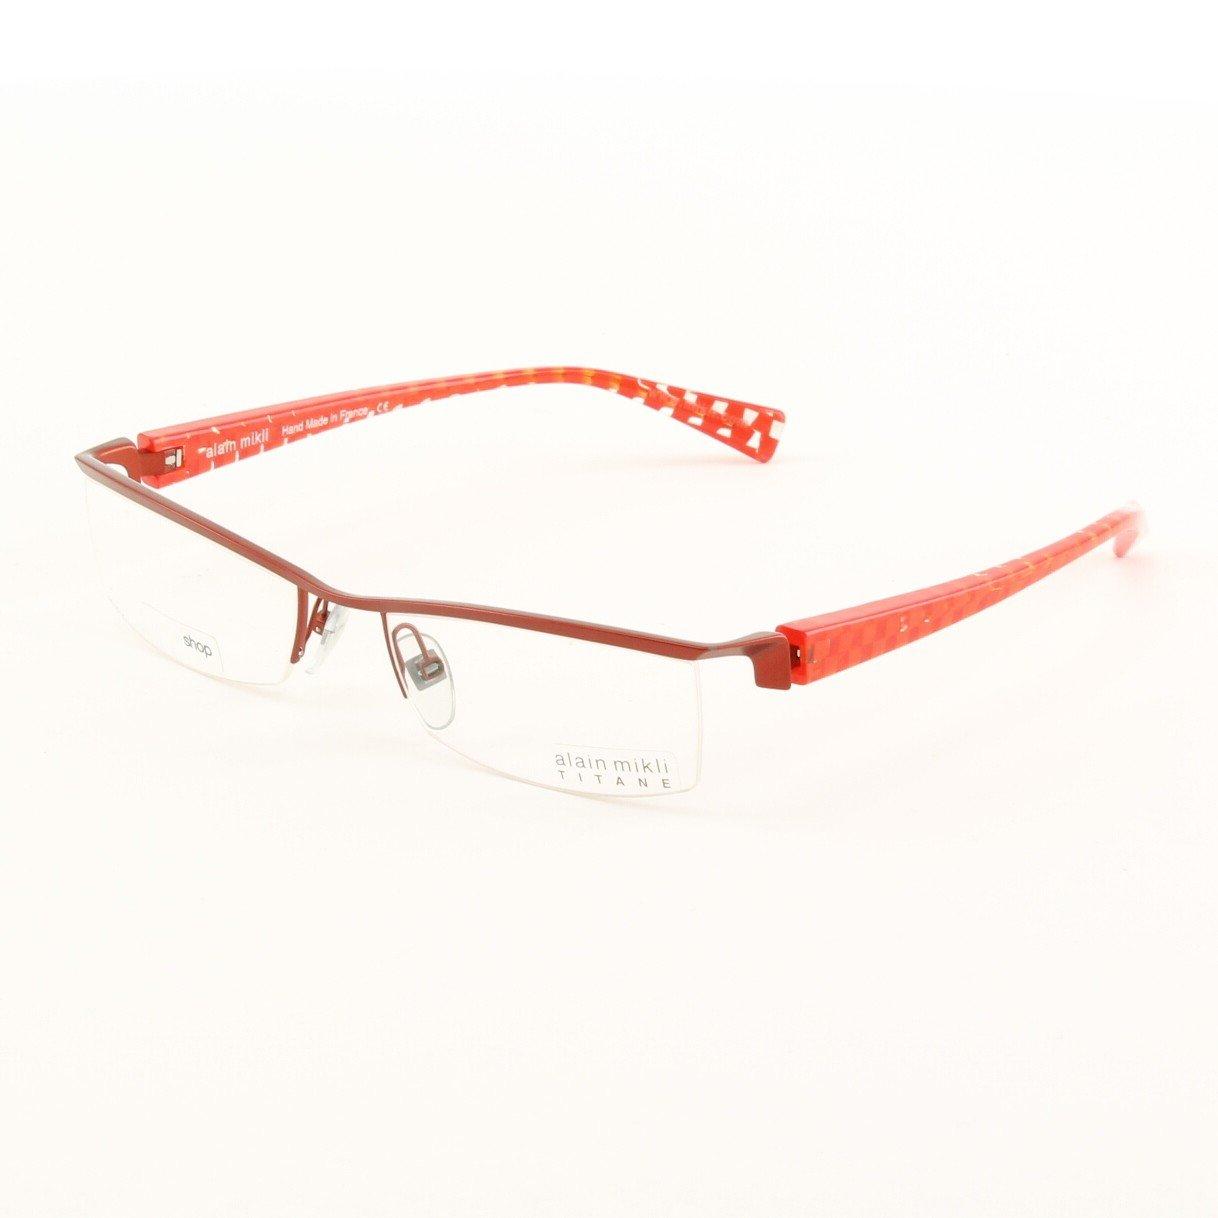 Alain Mikli Eyeglasses AL0523 Col. 20 Licorice Metallic Frame with Checkerboard Temples